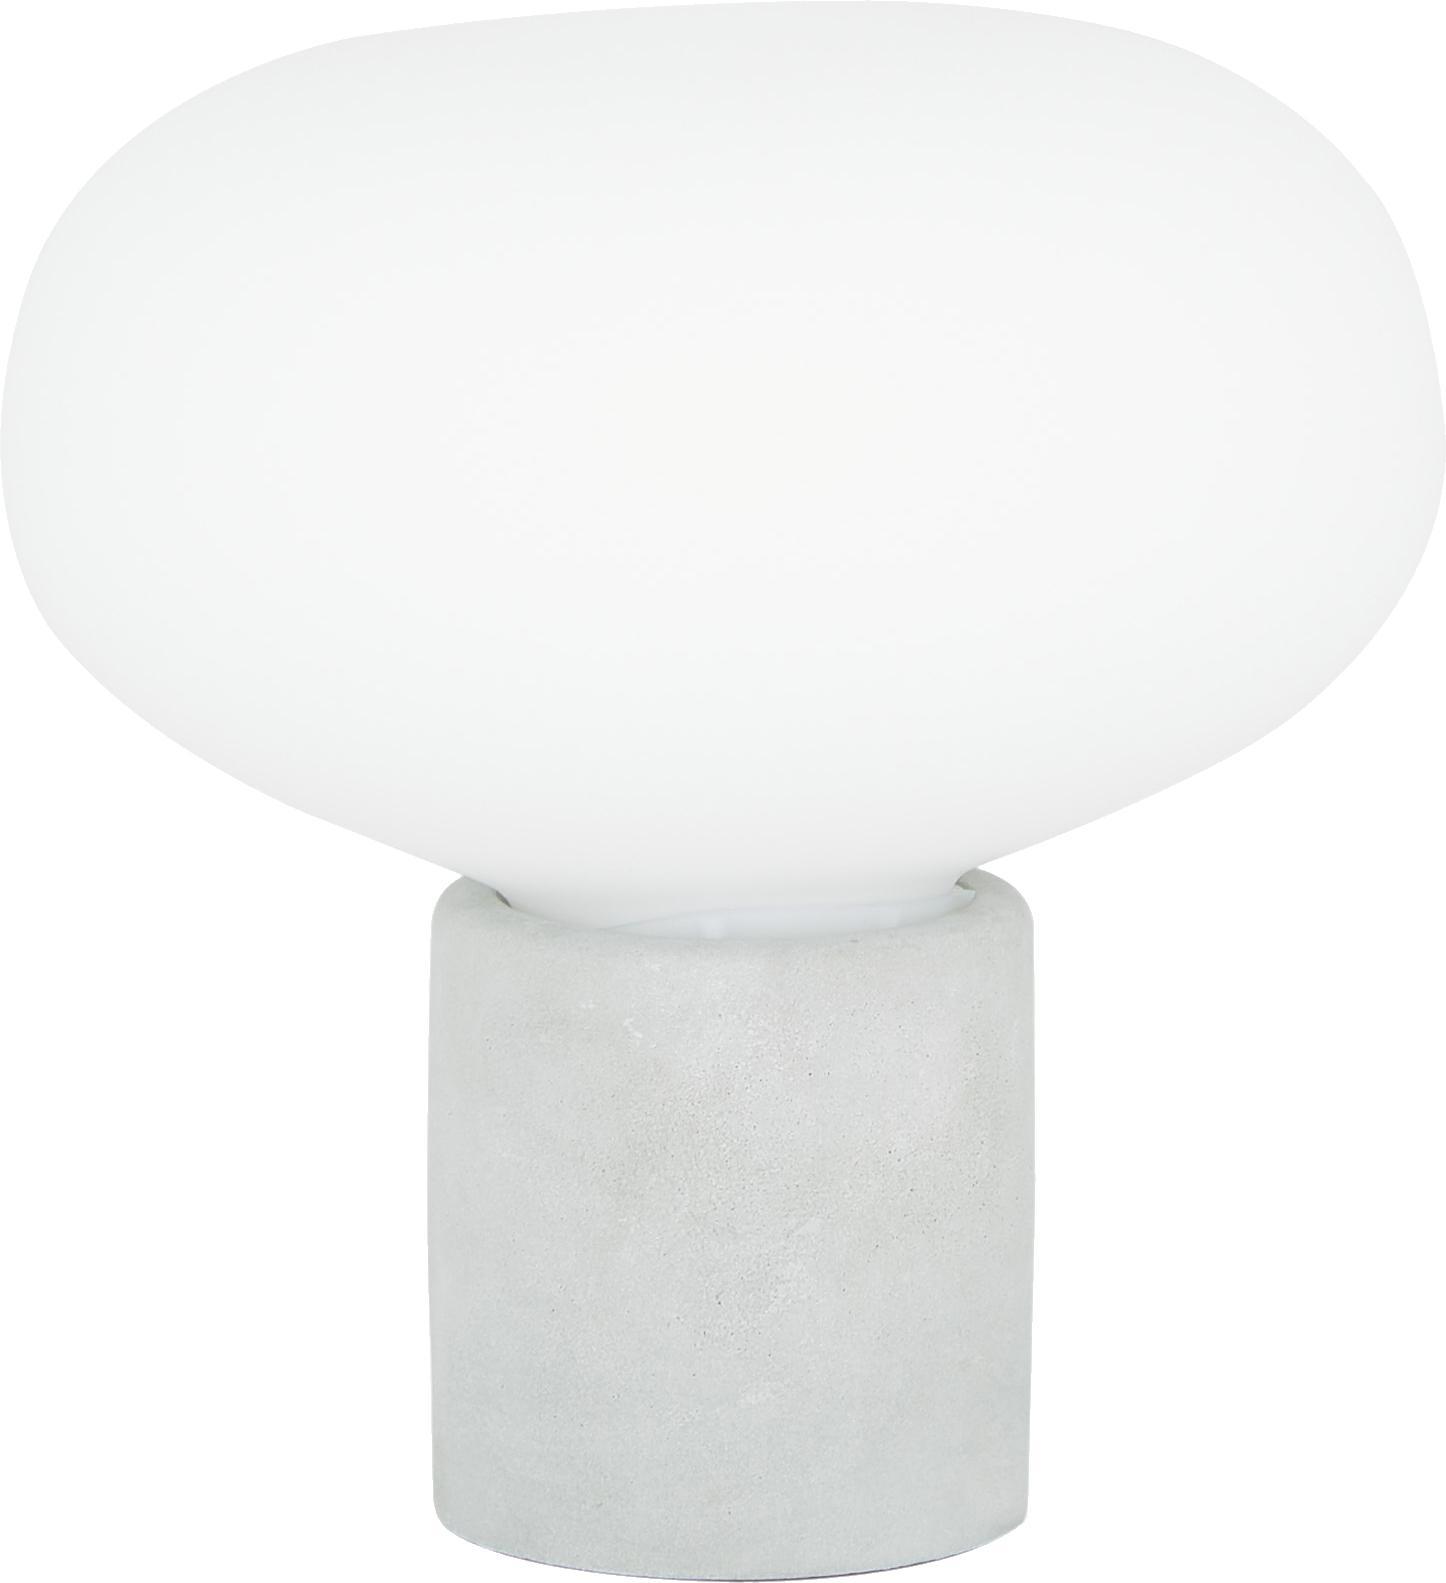 Tafellamp Alma met betonnen voet, Lampvoet: beton, Lampenkap: glas, Lampvoet: grijs, betonkleurig. Lampenkap: wit, Ø 23 x H 24 cm